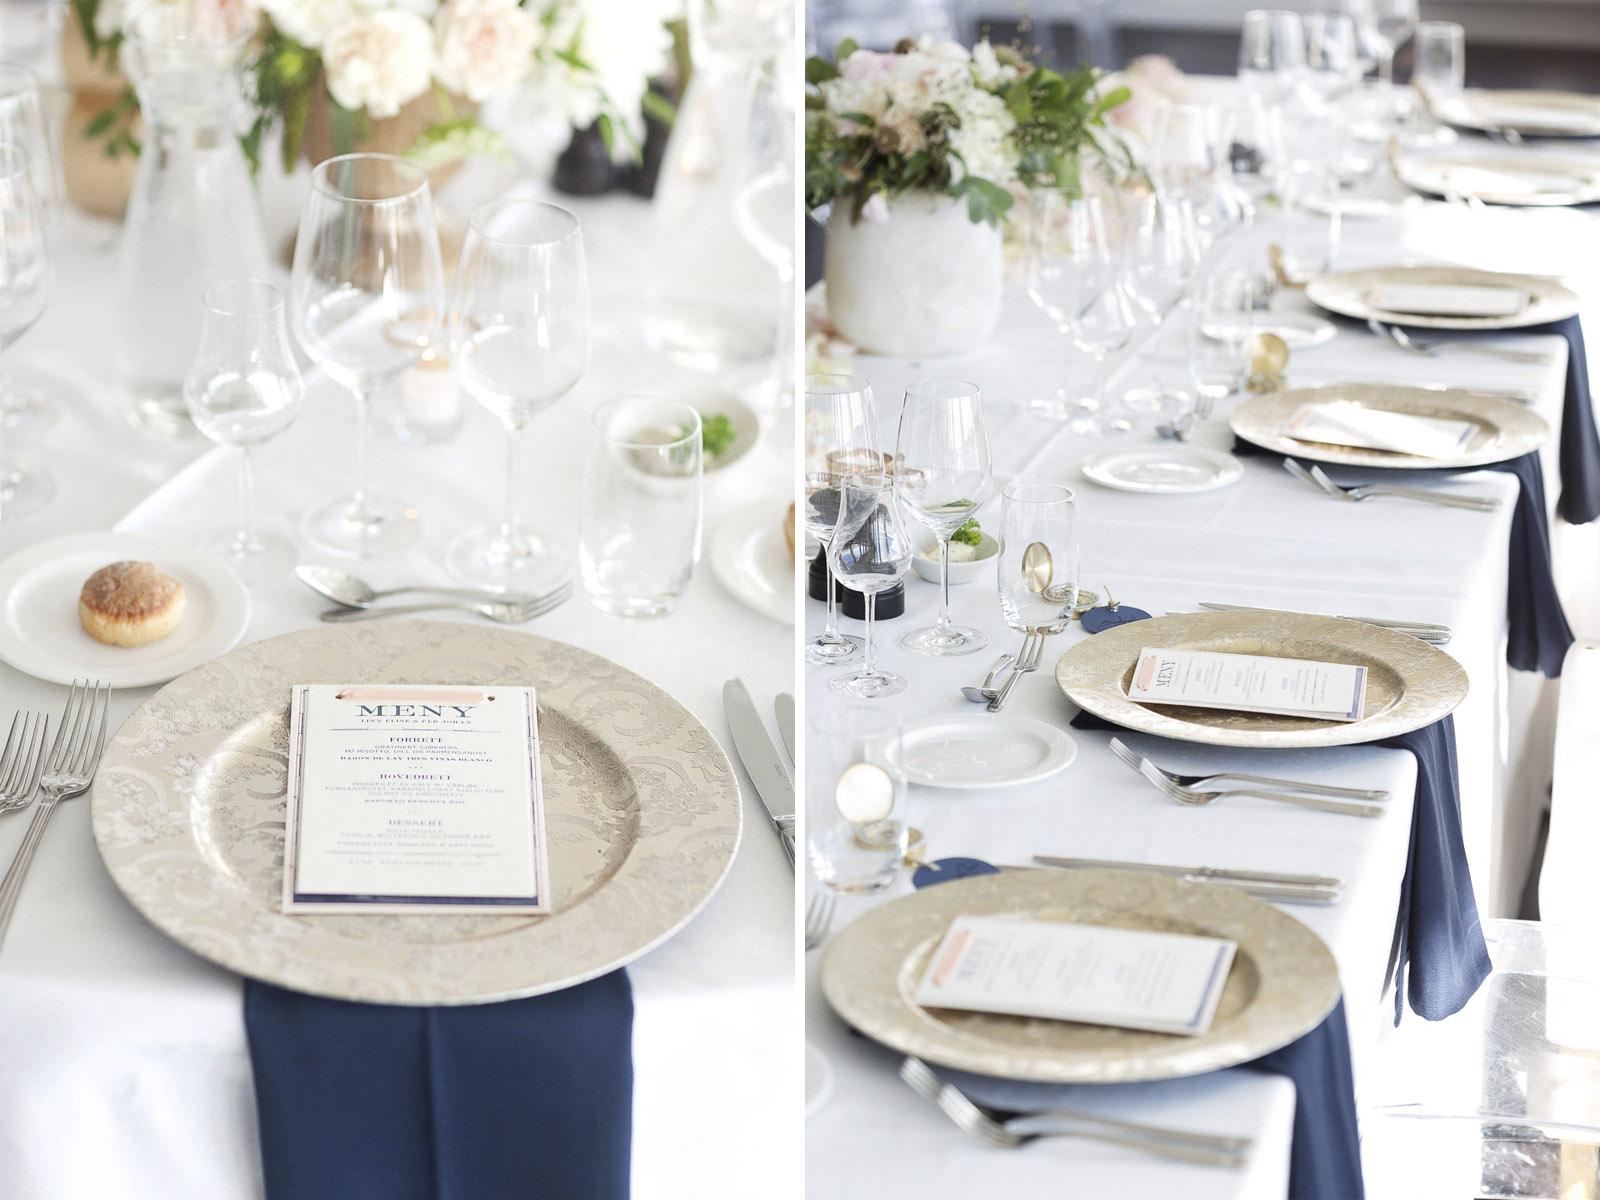 61 Støtvig hotel bryllup